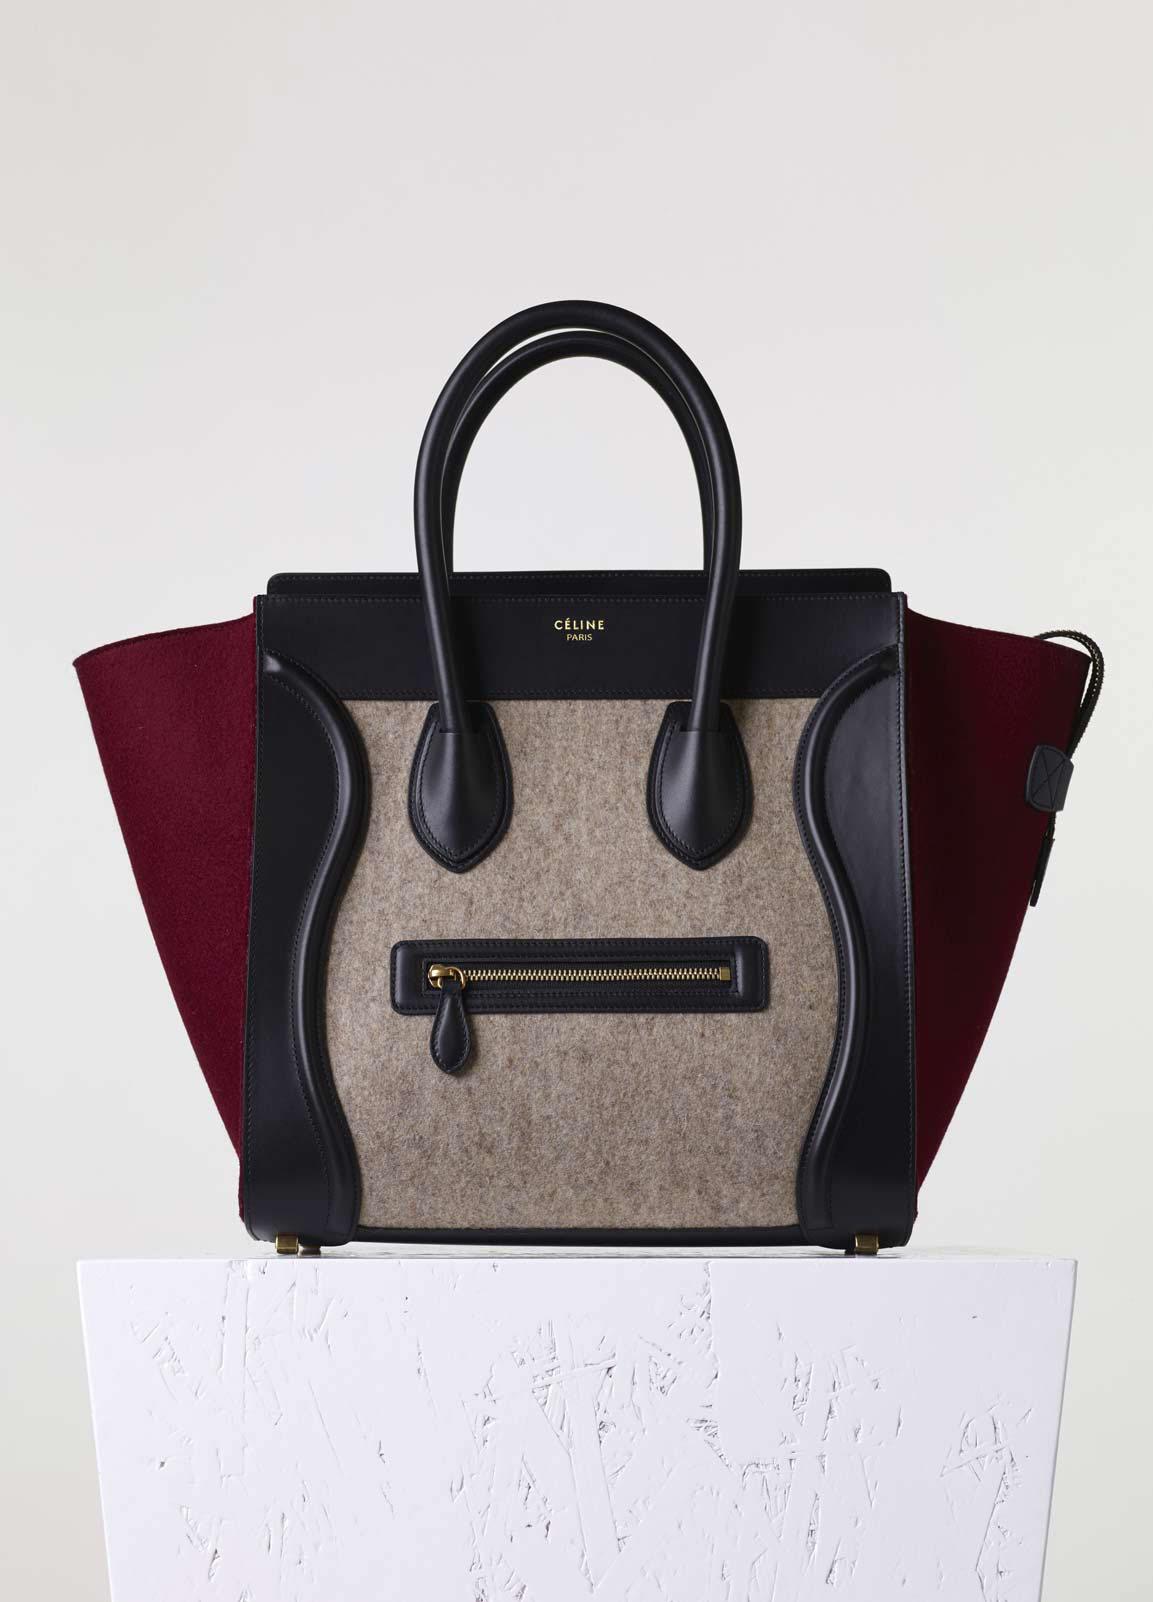 011531812ab1 celine fall winter 2015 bags handbags purses season collection